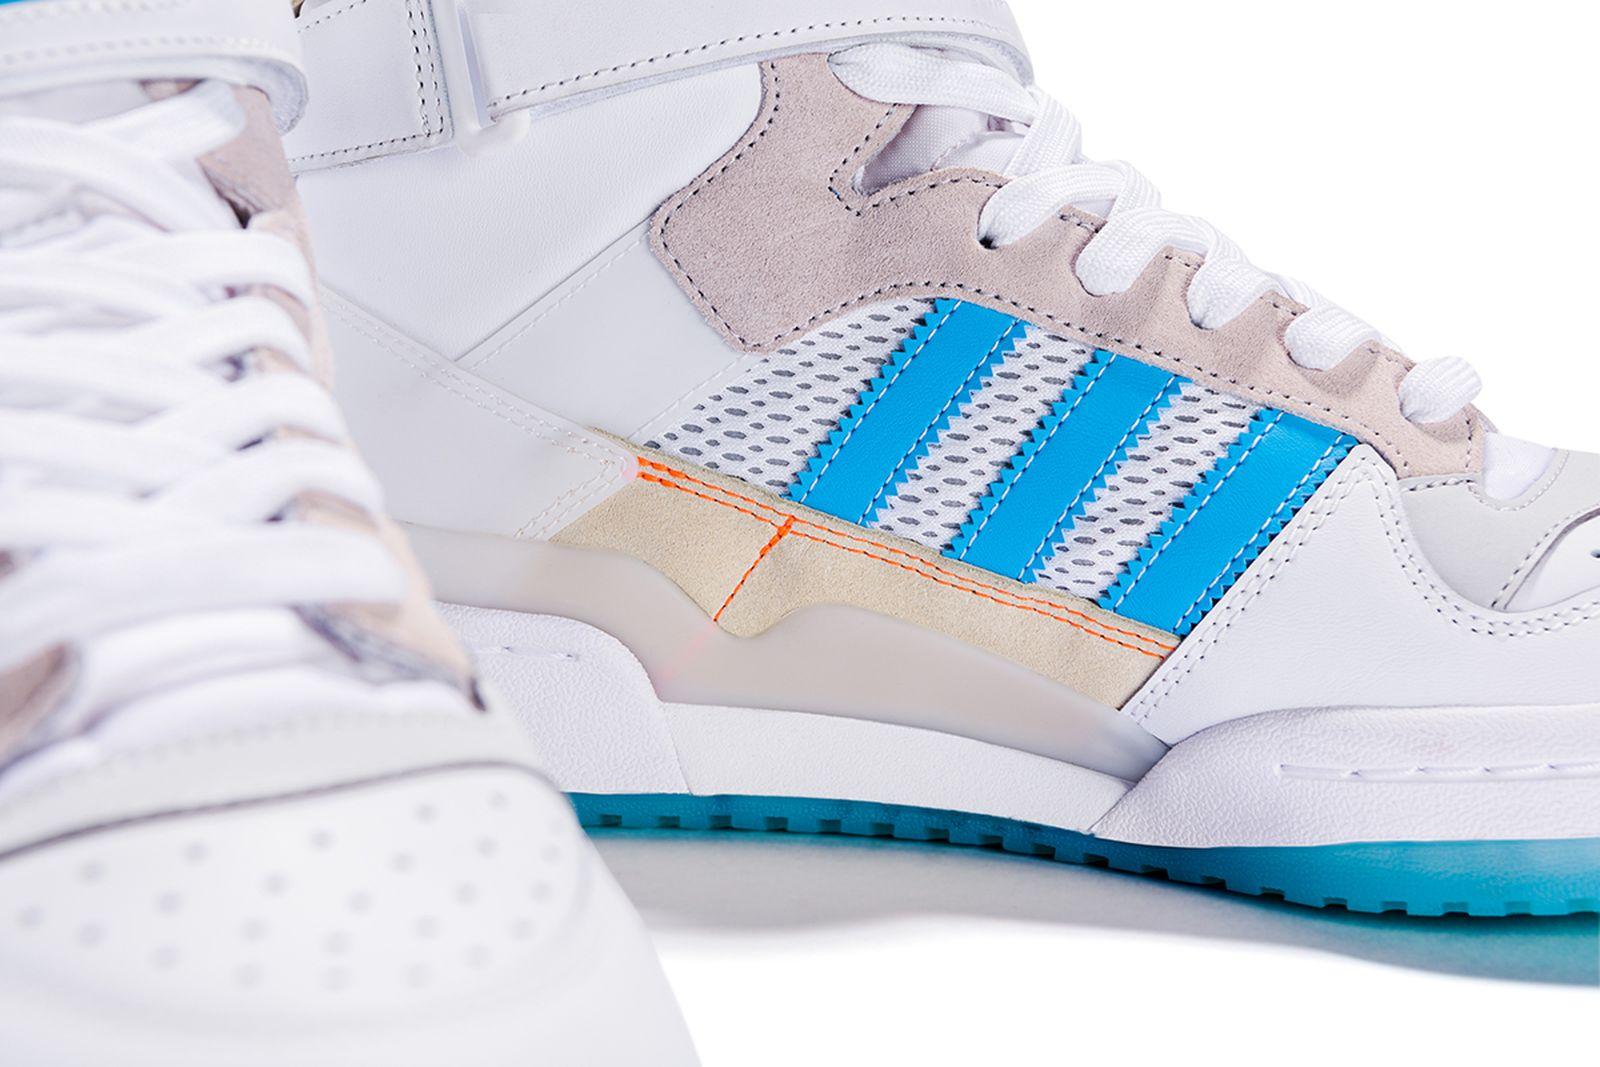 adidas-skateboarding-forum-84-adv-diego-najera-release-date-price-1-01